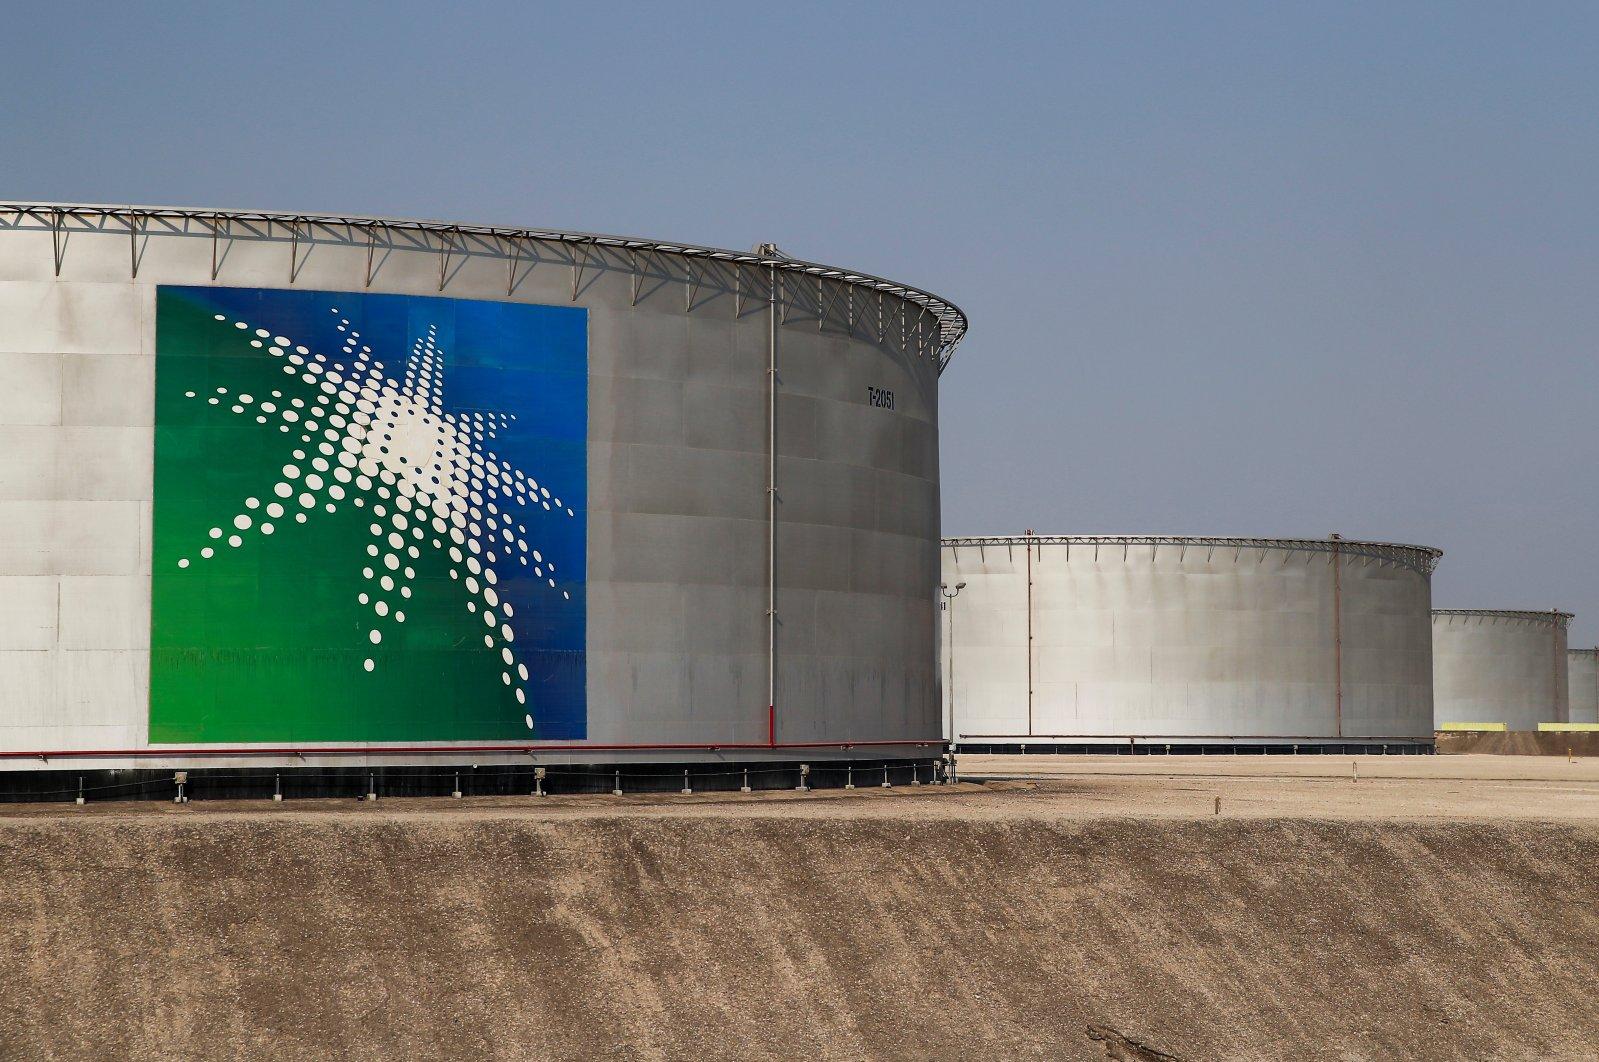 A view shows branded oil tanks at the Saudi Aramco oil facility in Abqaiq, Saudi Arabia, Oct. 12, 2019. (Reuters Photo)